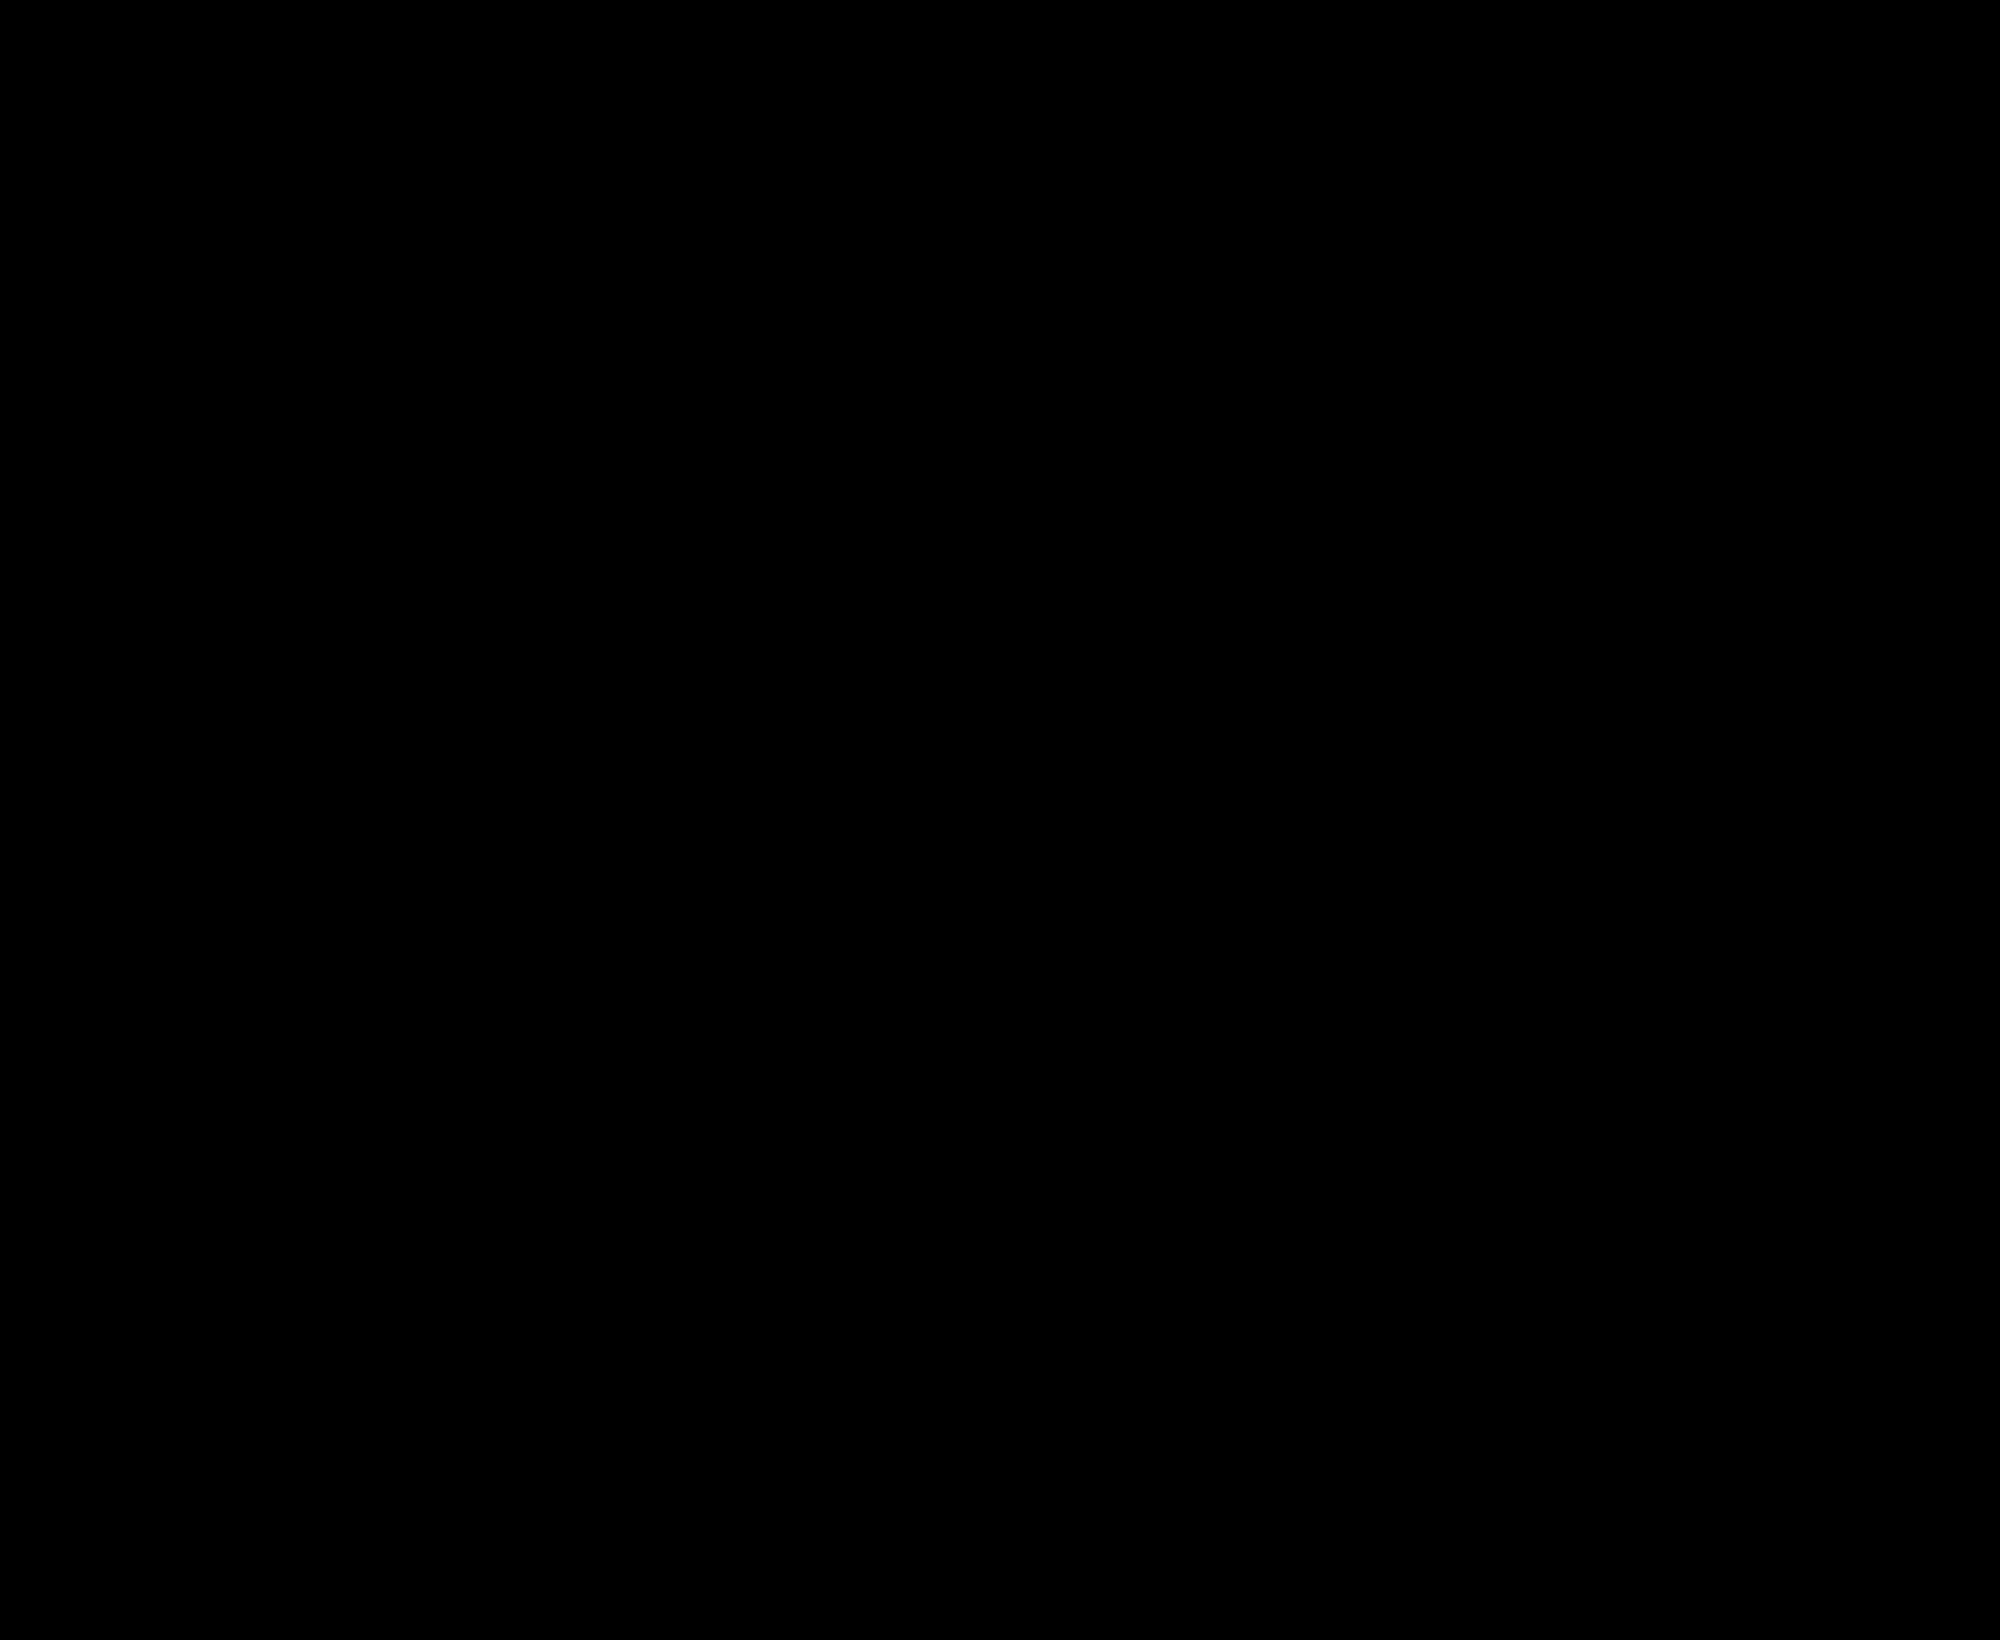 2000x1640 Filevideo Game Controller Icon Designed By Maico Amorim.svg